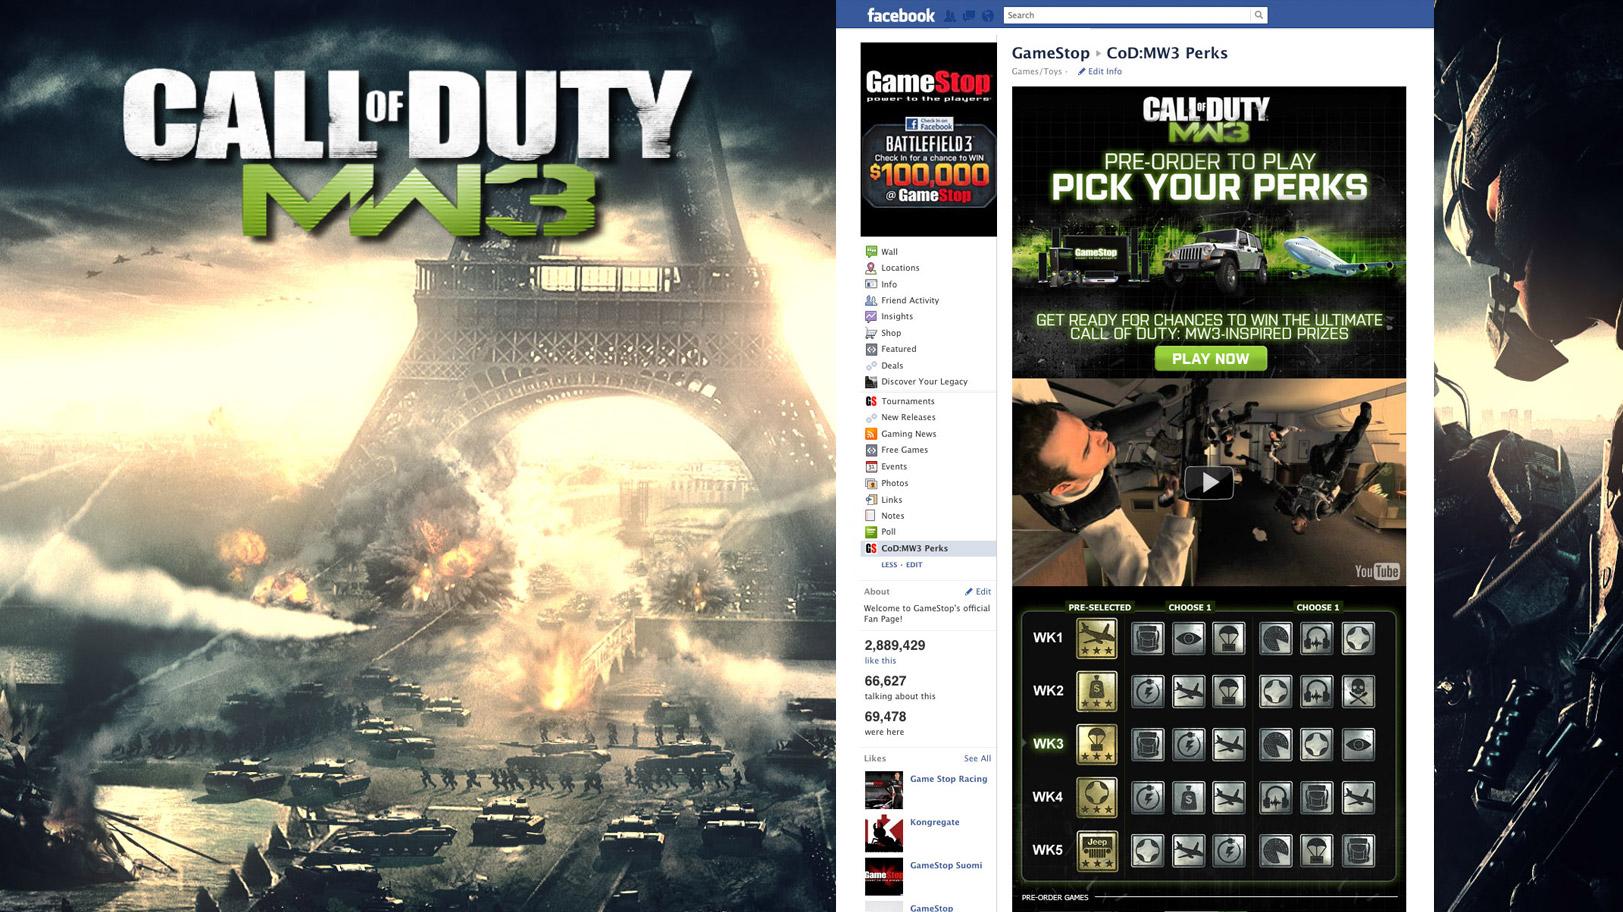 Gamestop CoD:MW3 Perks Facebook Tab